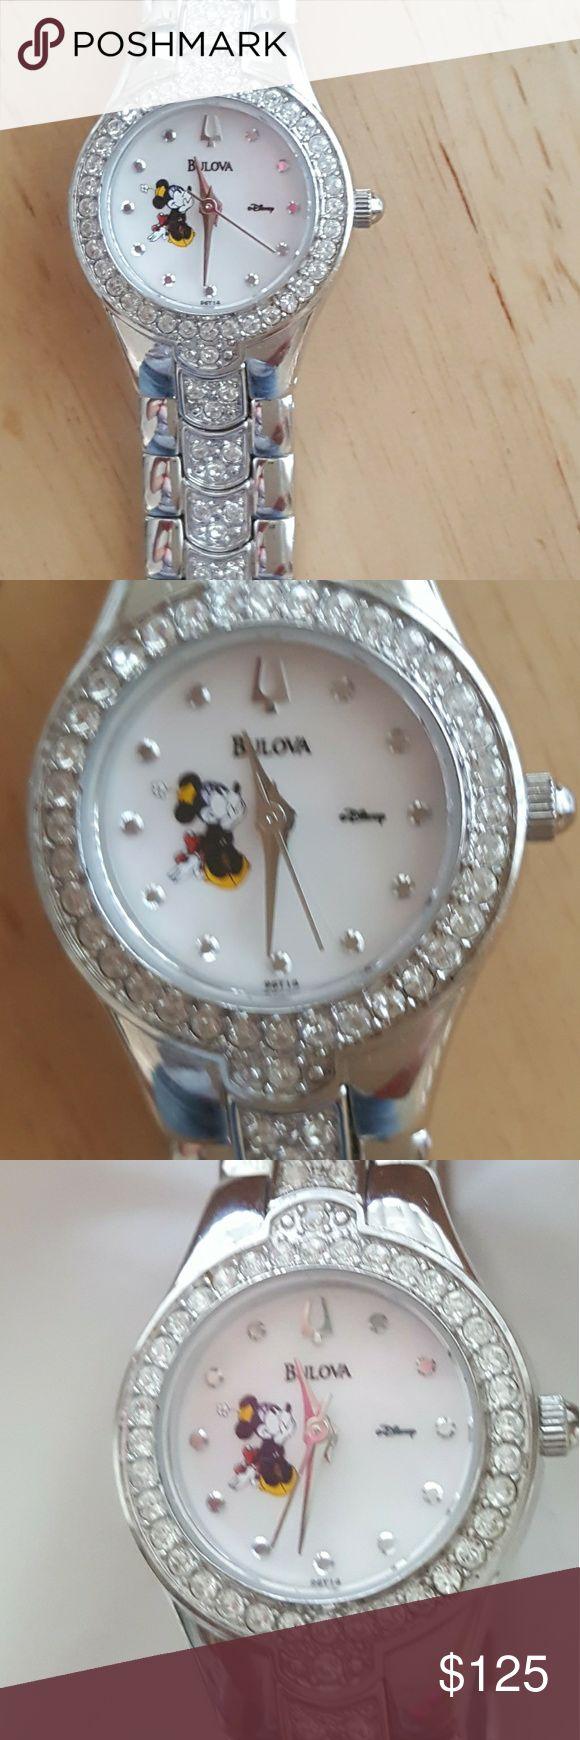 Bulova Mickey Watch Water Resistant, no box, worn it once Bulova Accessories Watches